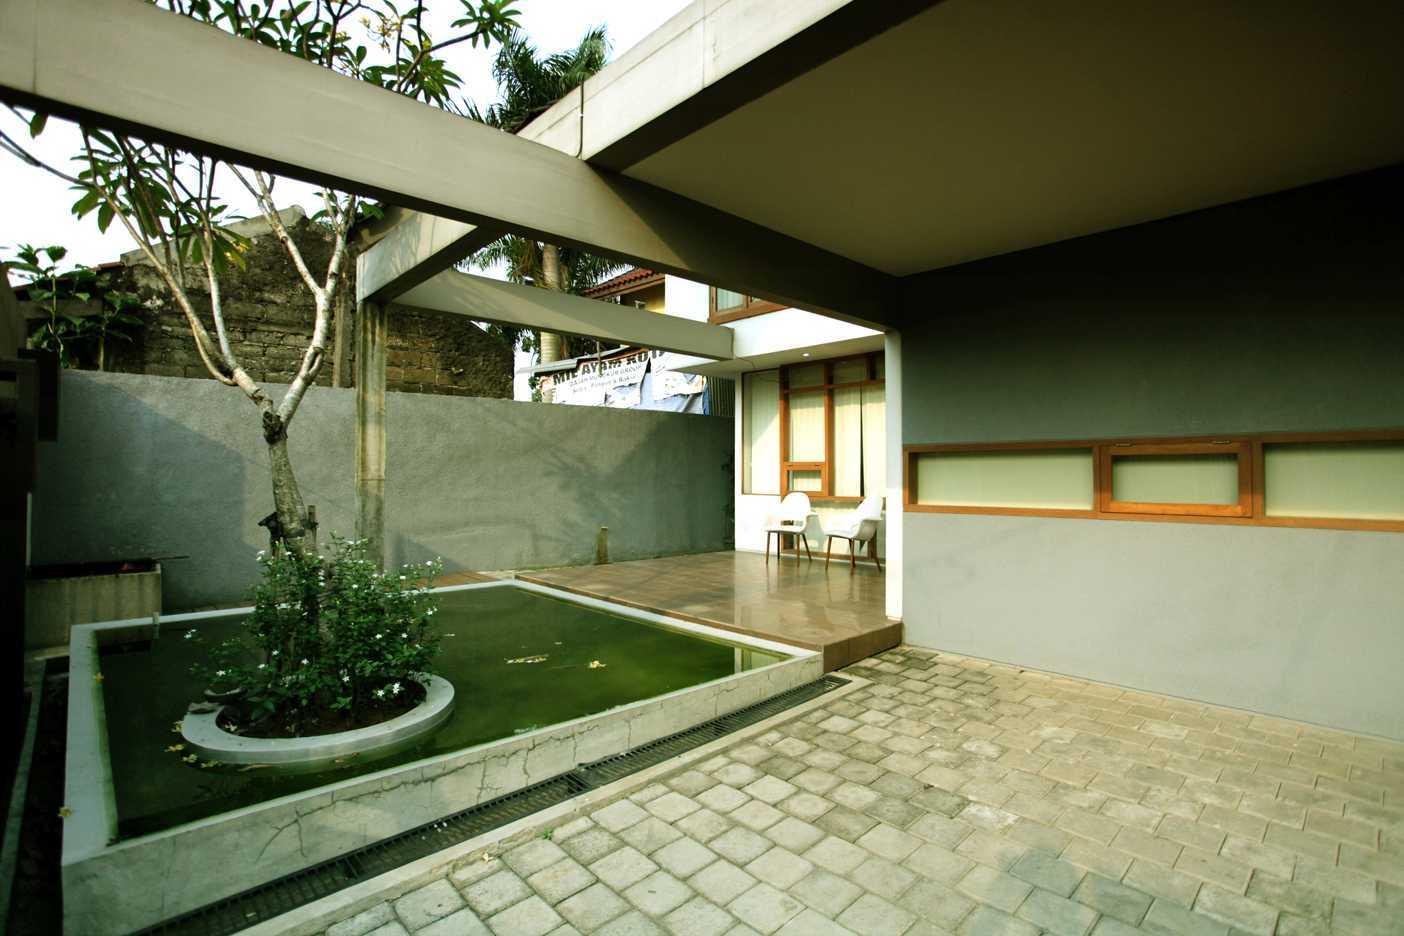 Armeyn Ilyas Doctor House Kelapa Dua Wetan, Ciracas, East Jakarta City, Jakarta, Indonesia Jakarta Front Area Modern 17745